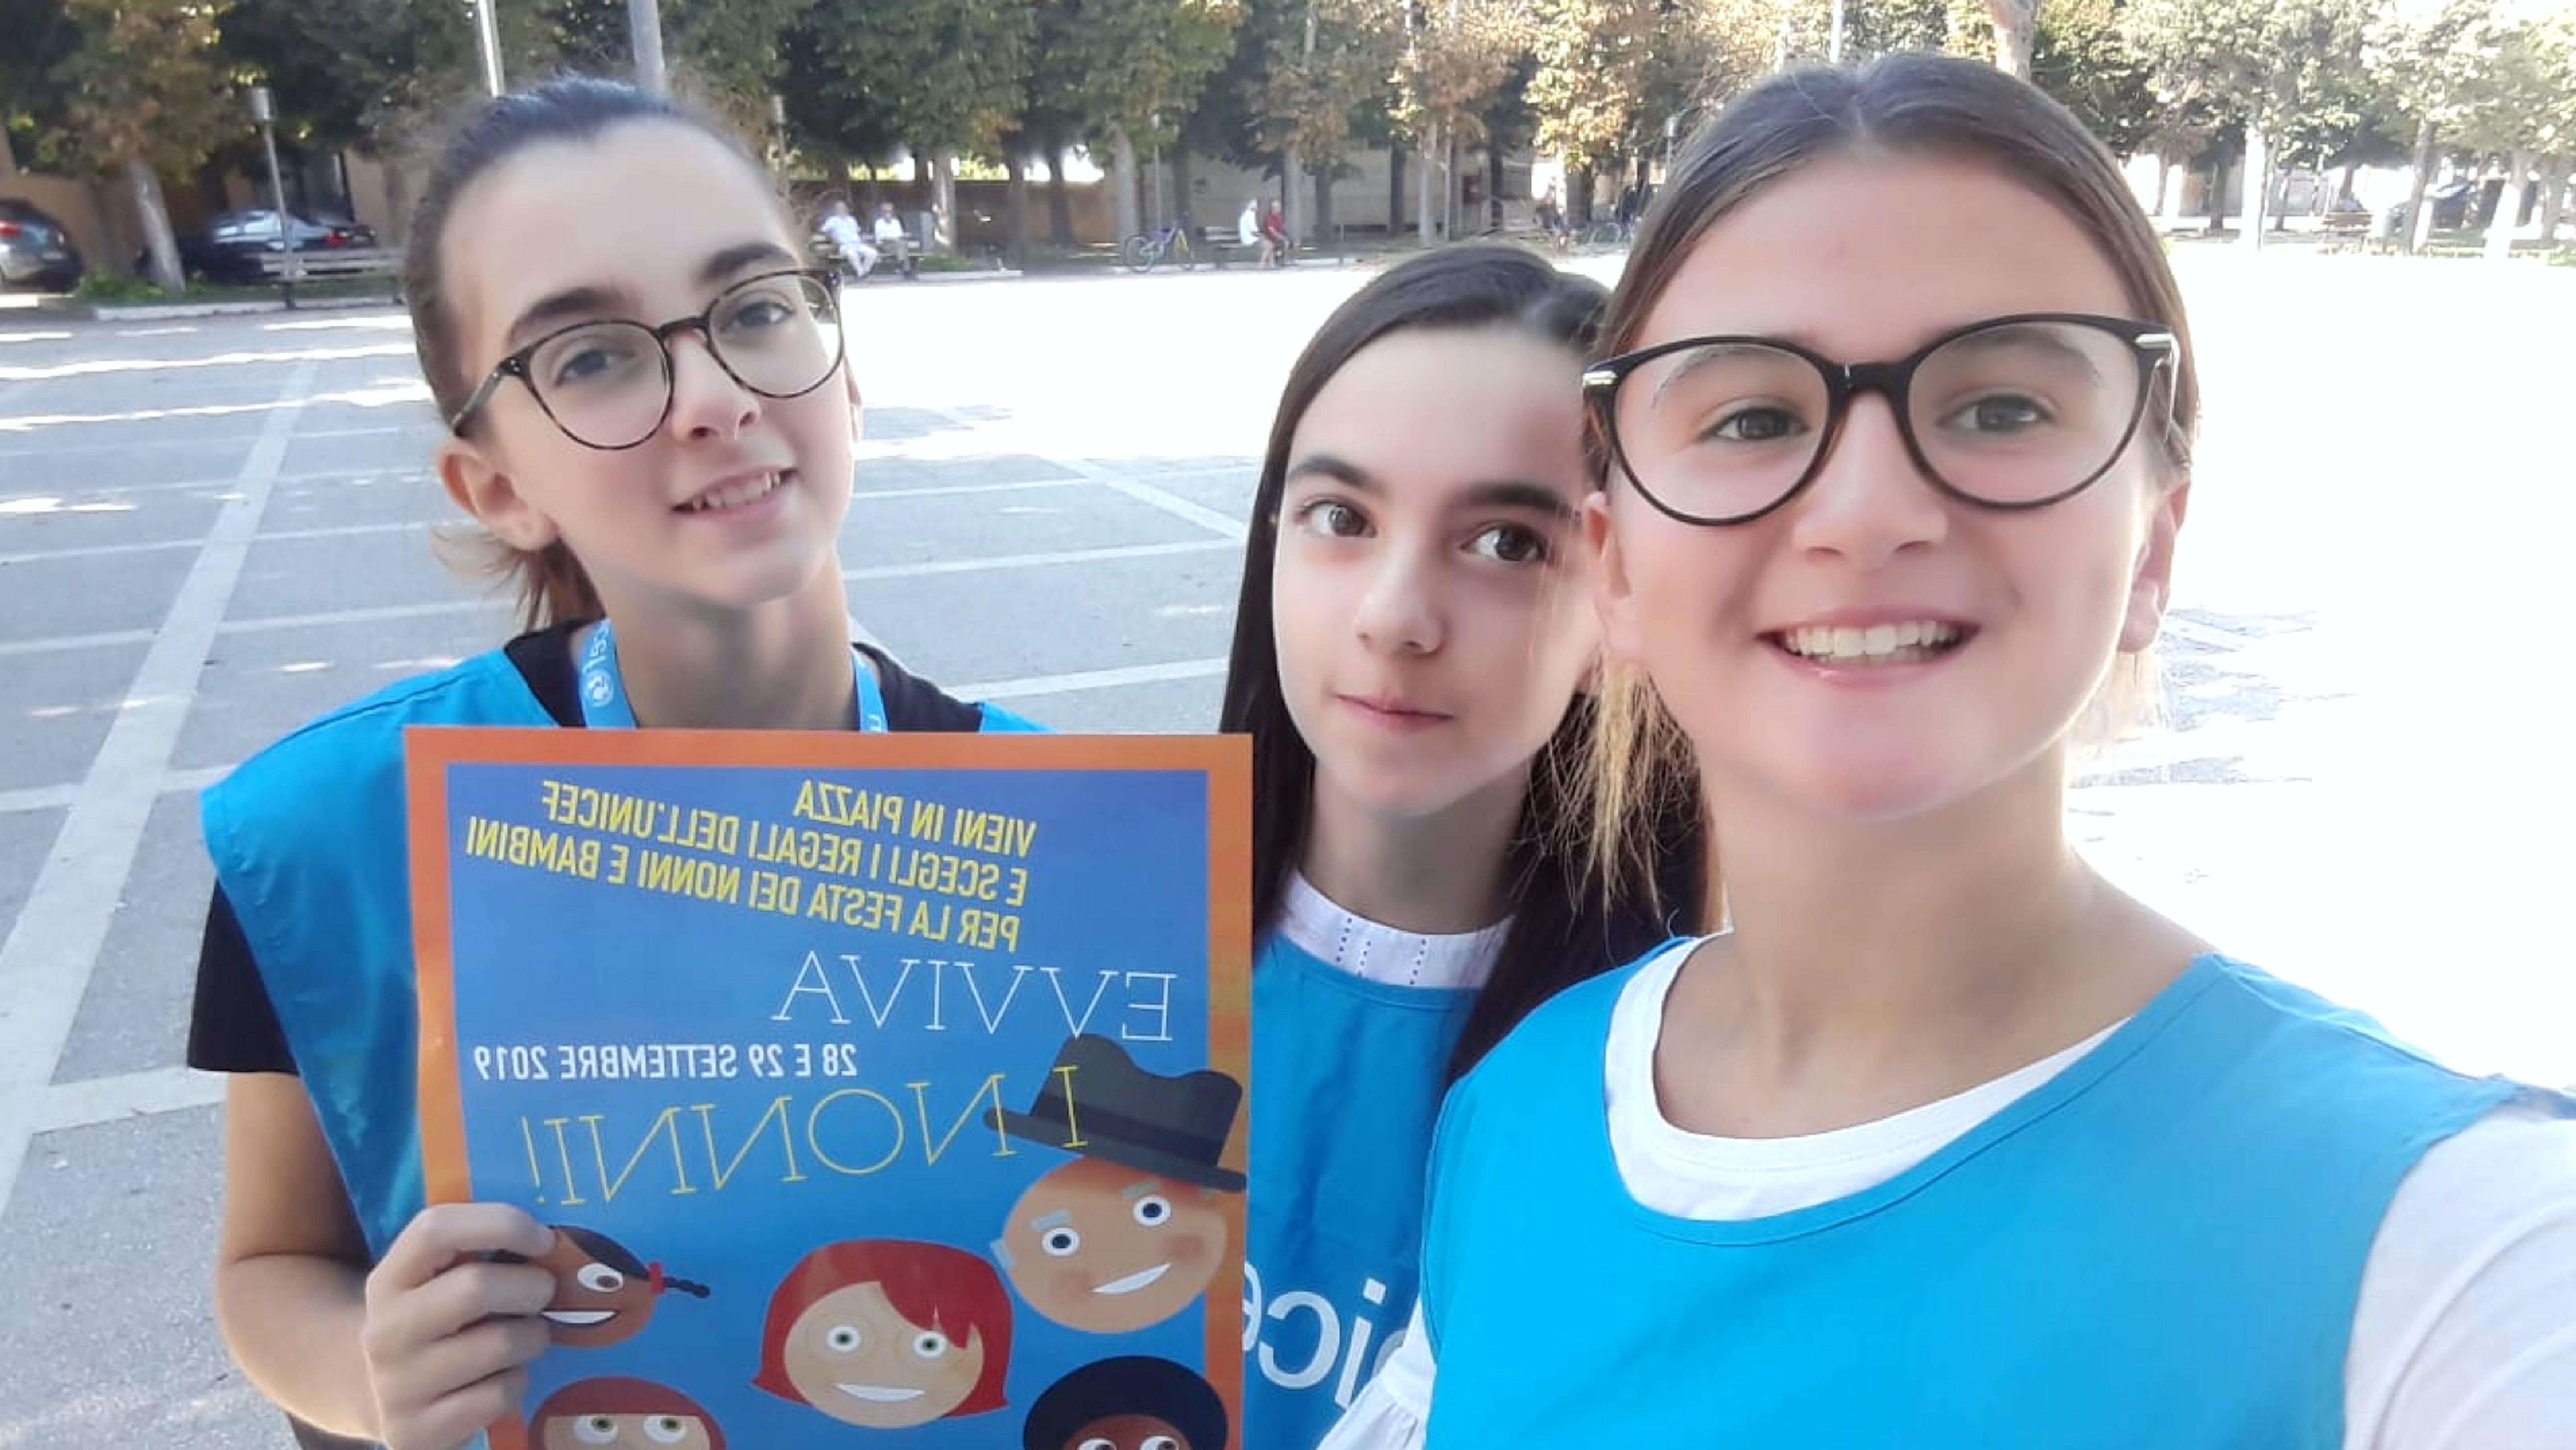 Giovanissime volontarie a Lecce